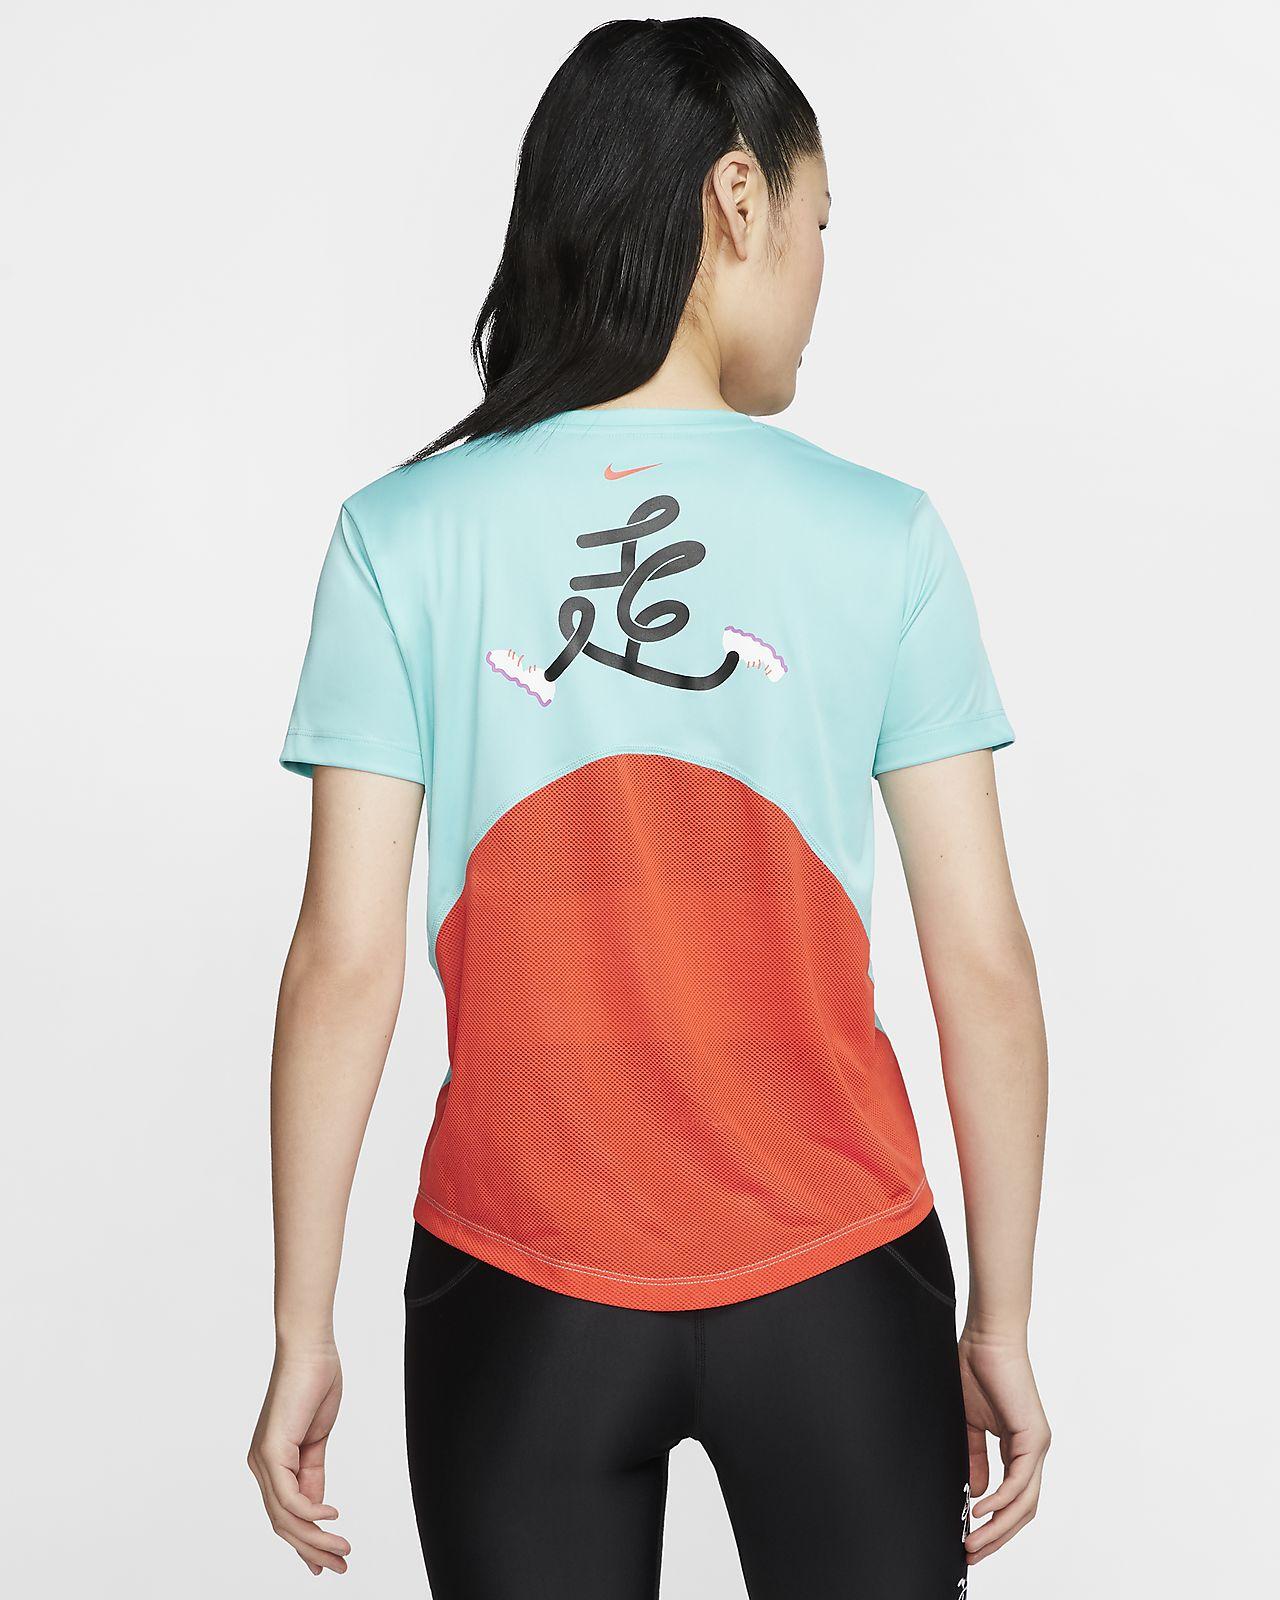 Nike Miler Tokyo Women's Short Sleeve Running Top